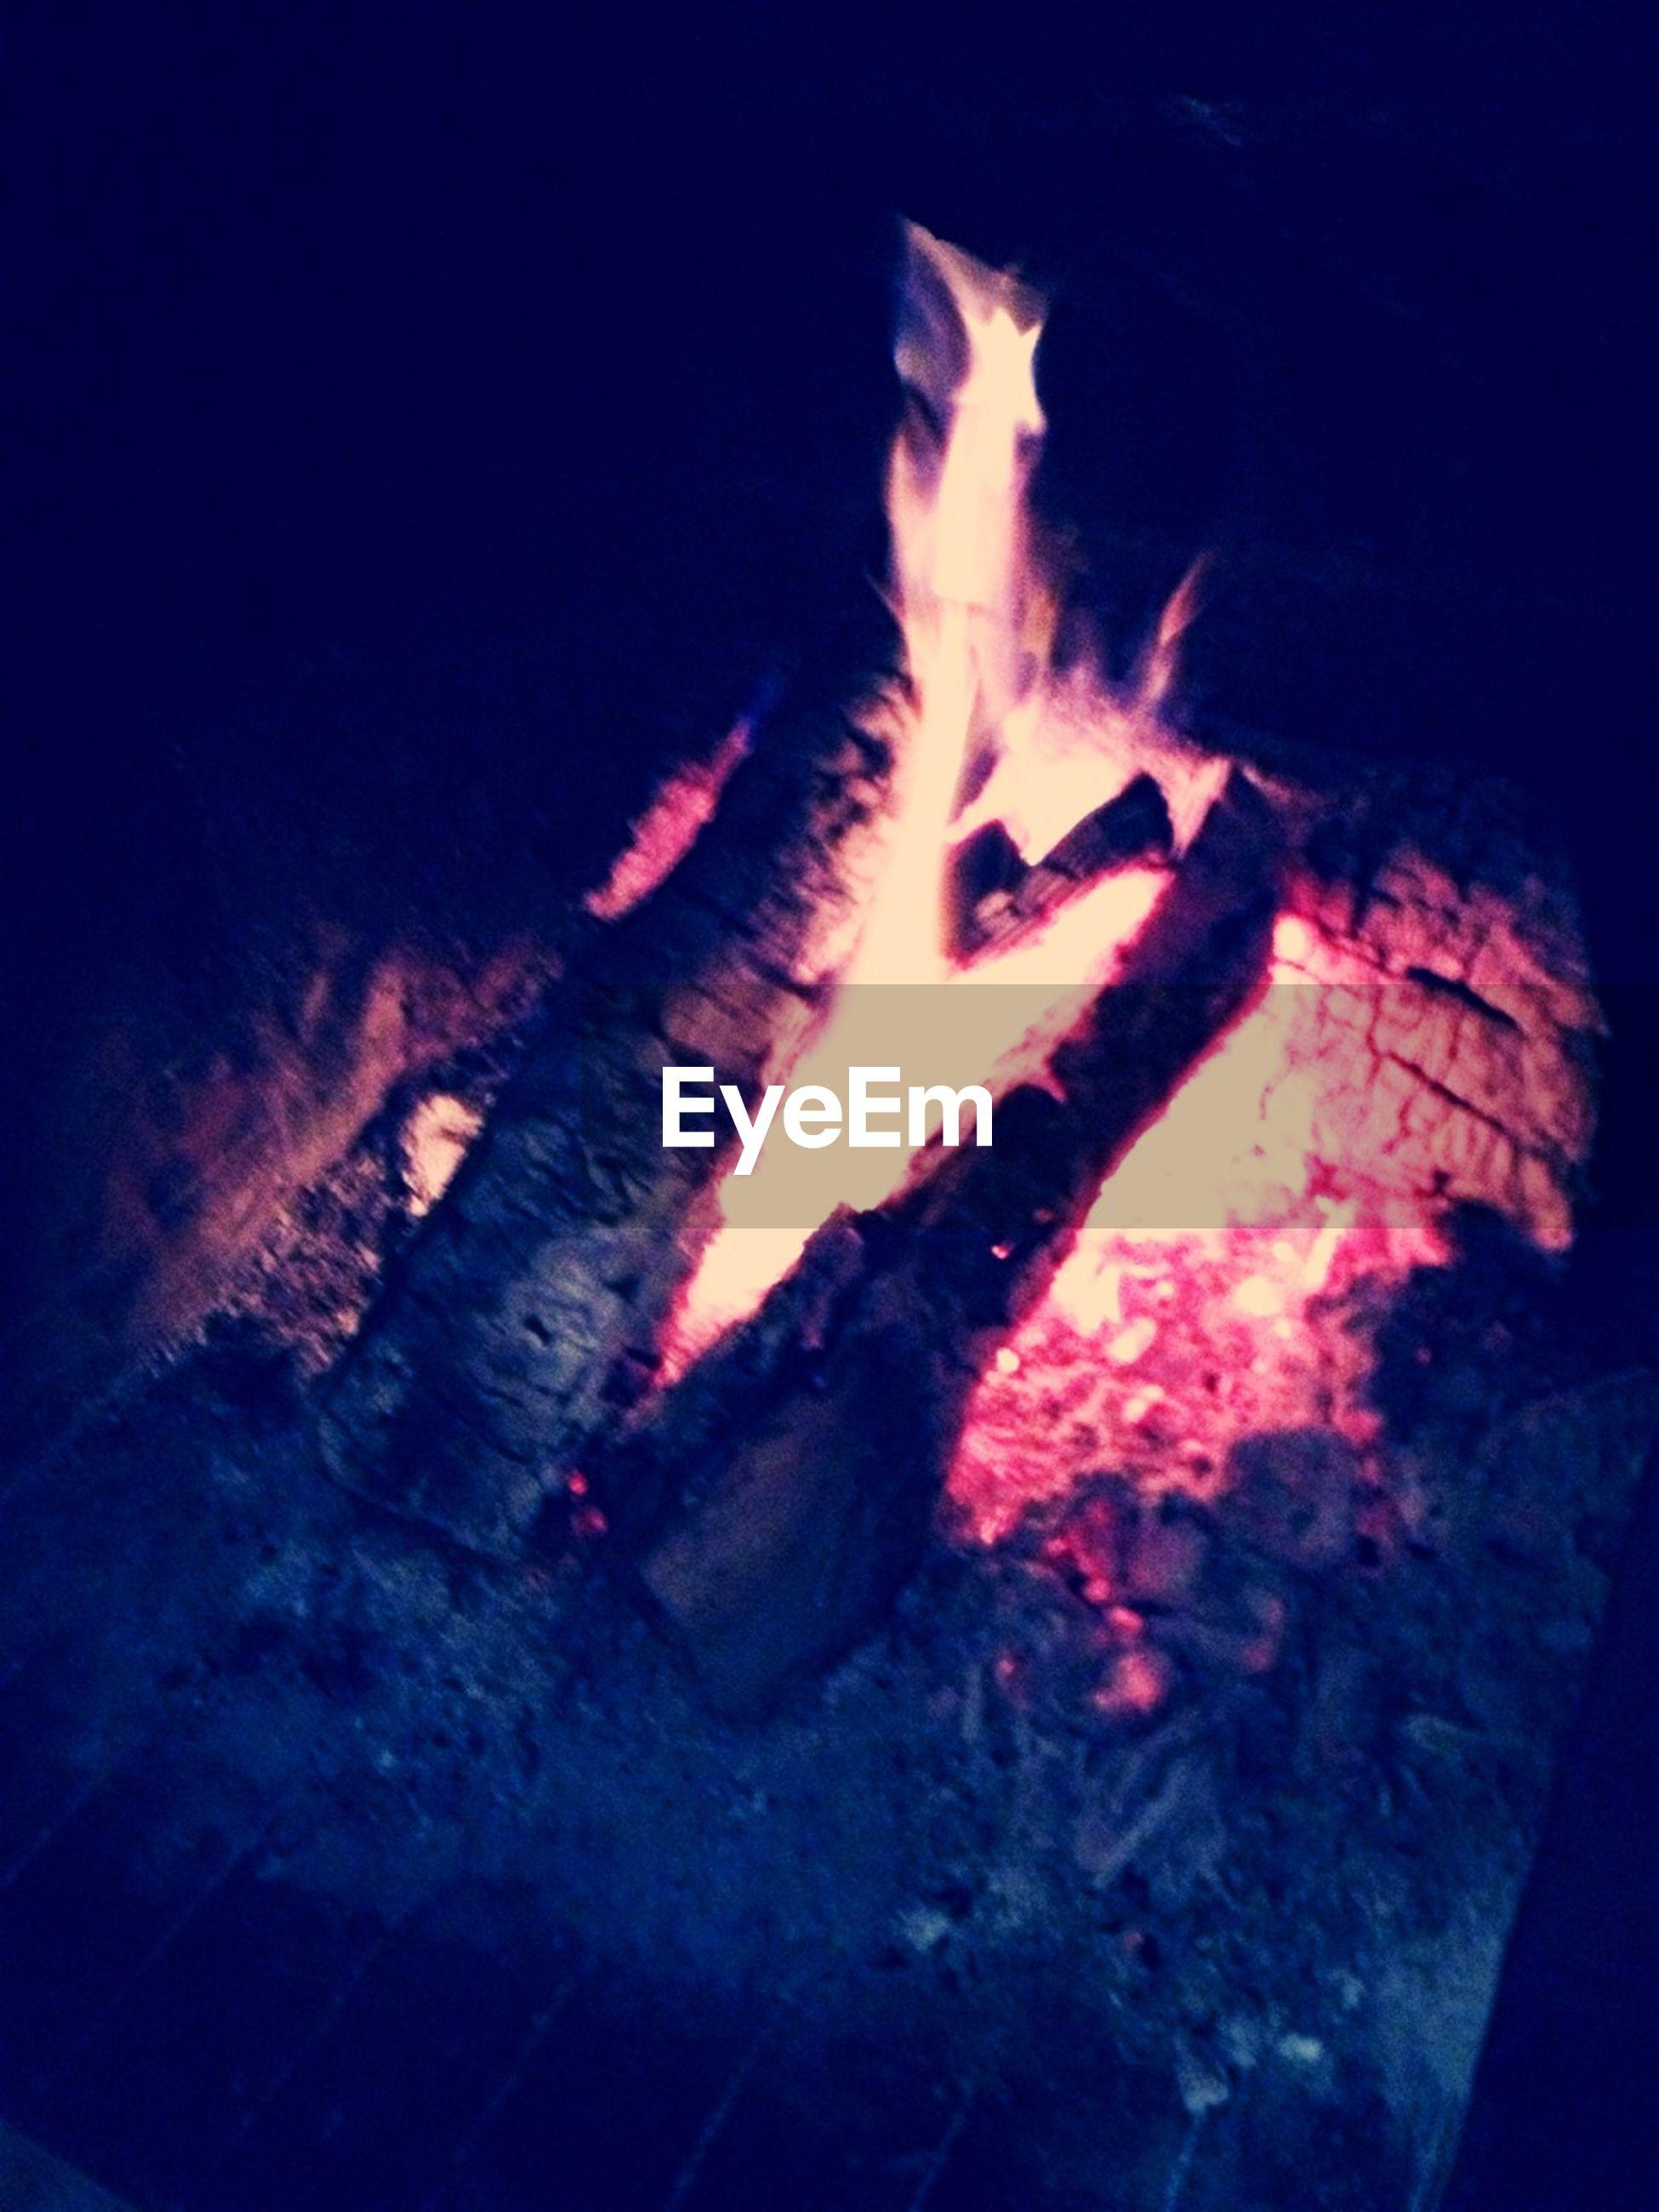 fire - natural phenomenon, night, burning, flame, heat - temperature, fish, glowing, animal themes, bonfire, high angle view, motion, indoors, sea life, illuminated, light - natural phenomenon, underwater, water, fire, no people, long exposure